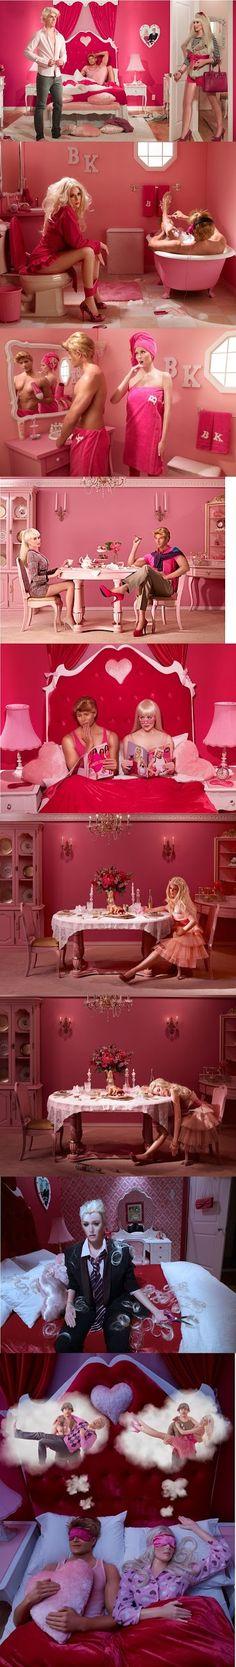 Funny Barbie and Ken Marriage♦ℬїт¢ℌαℓї¢їøυ﹩♦